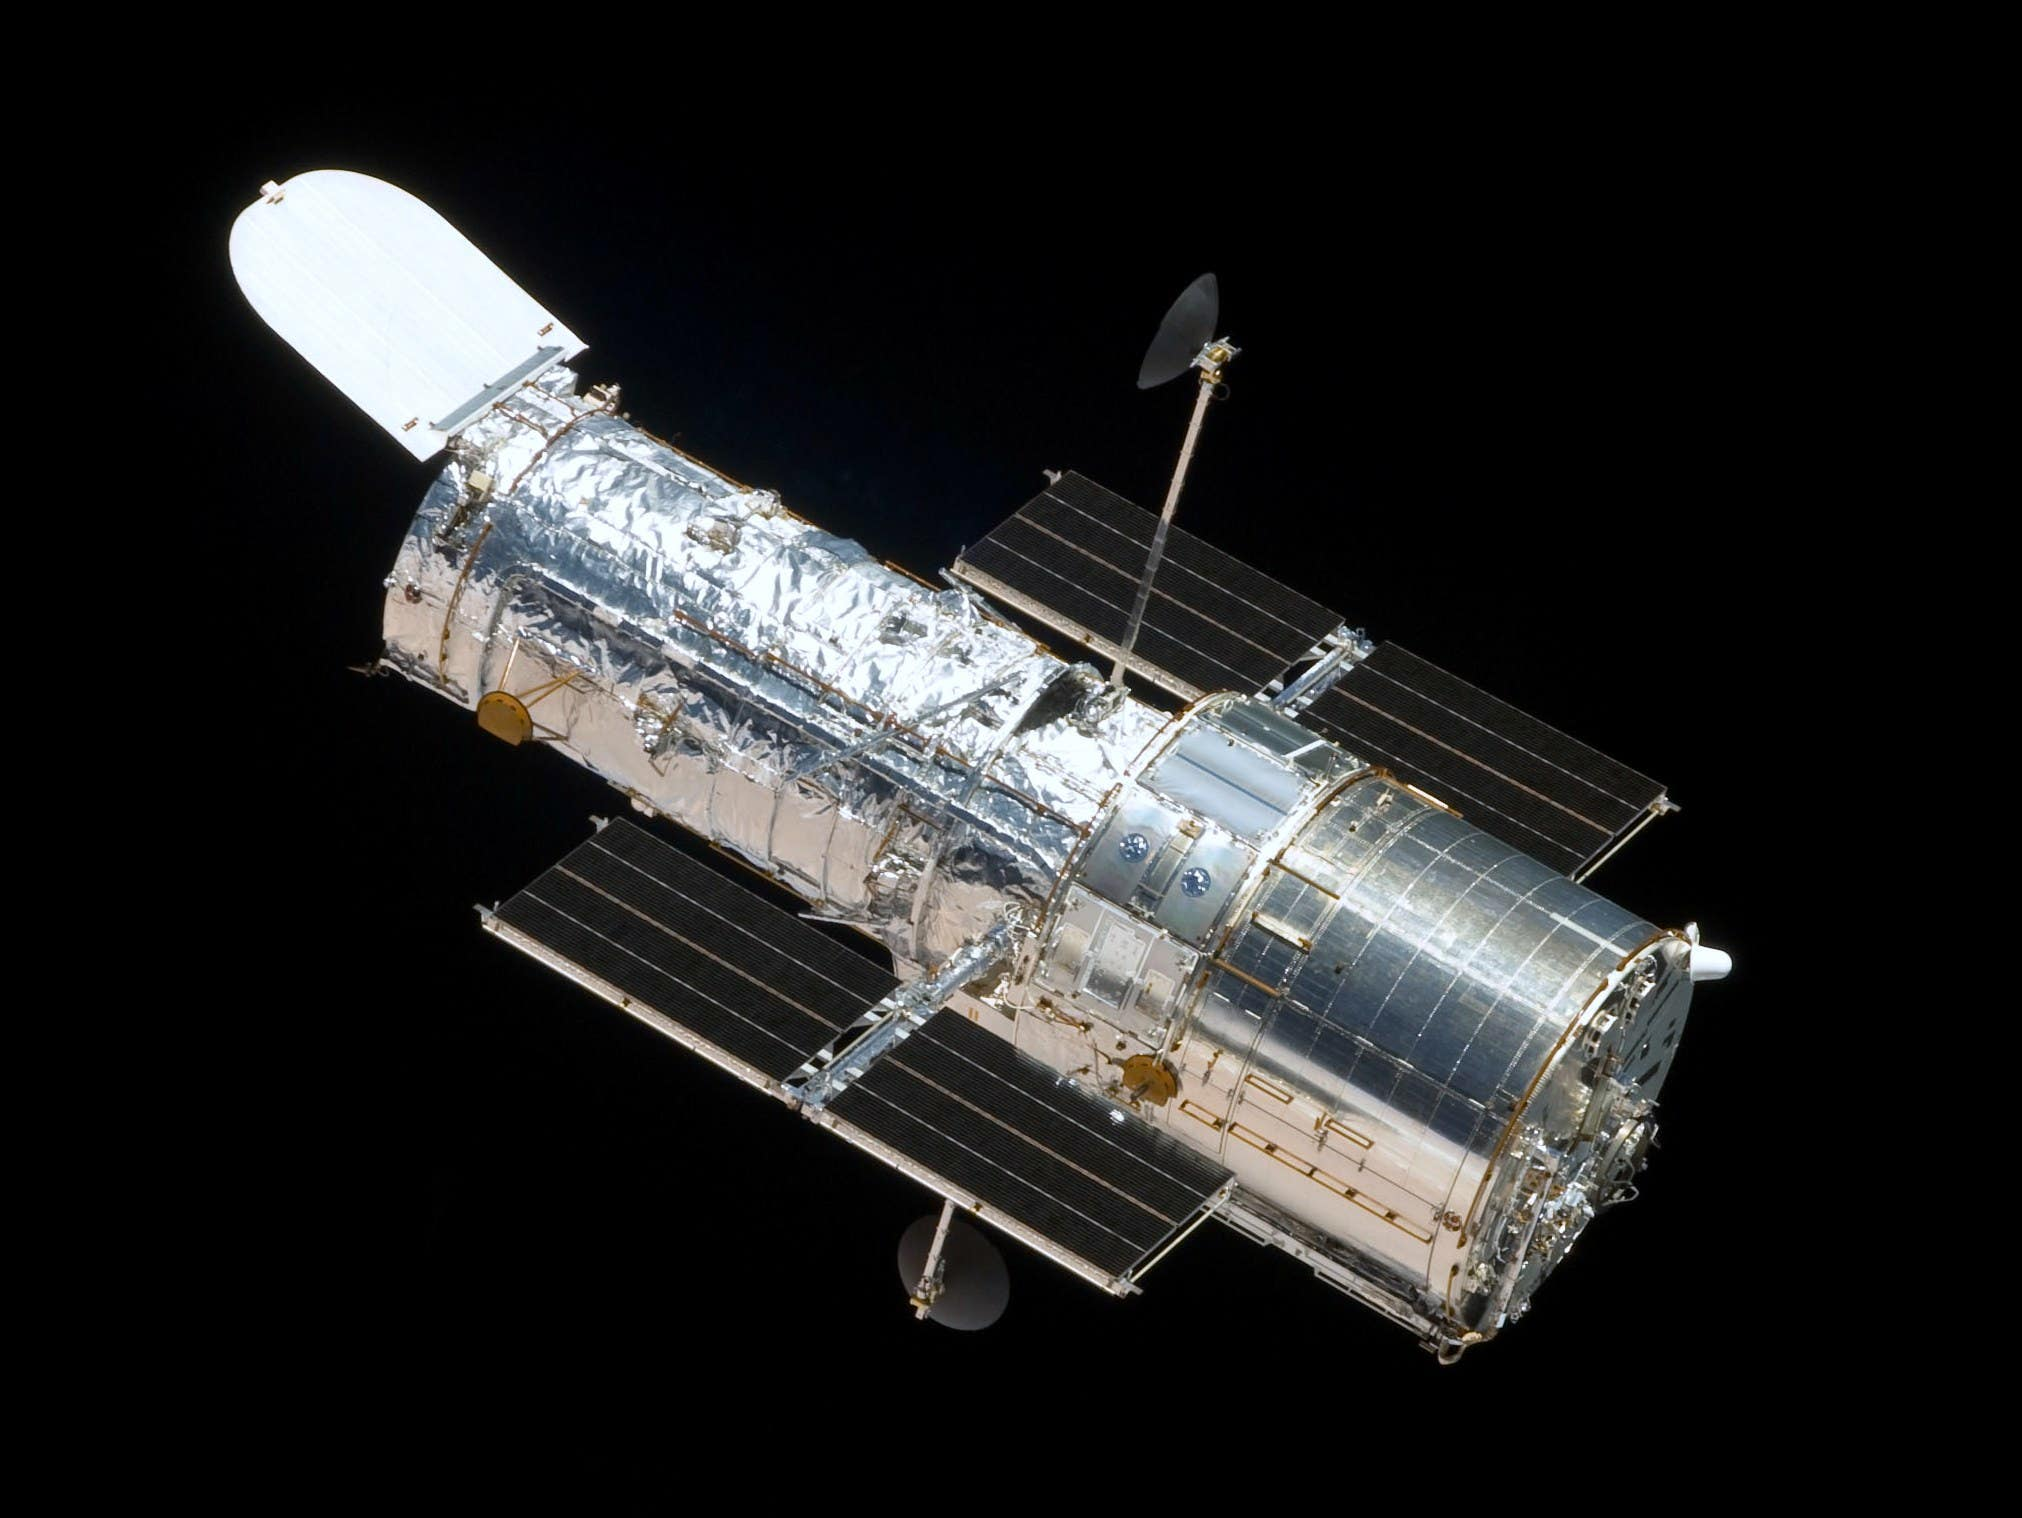 Satellites: Earth's Companions